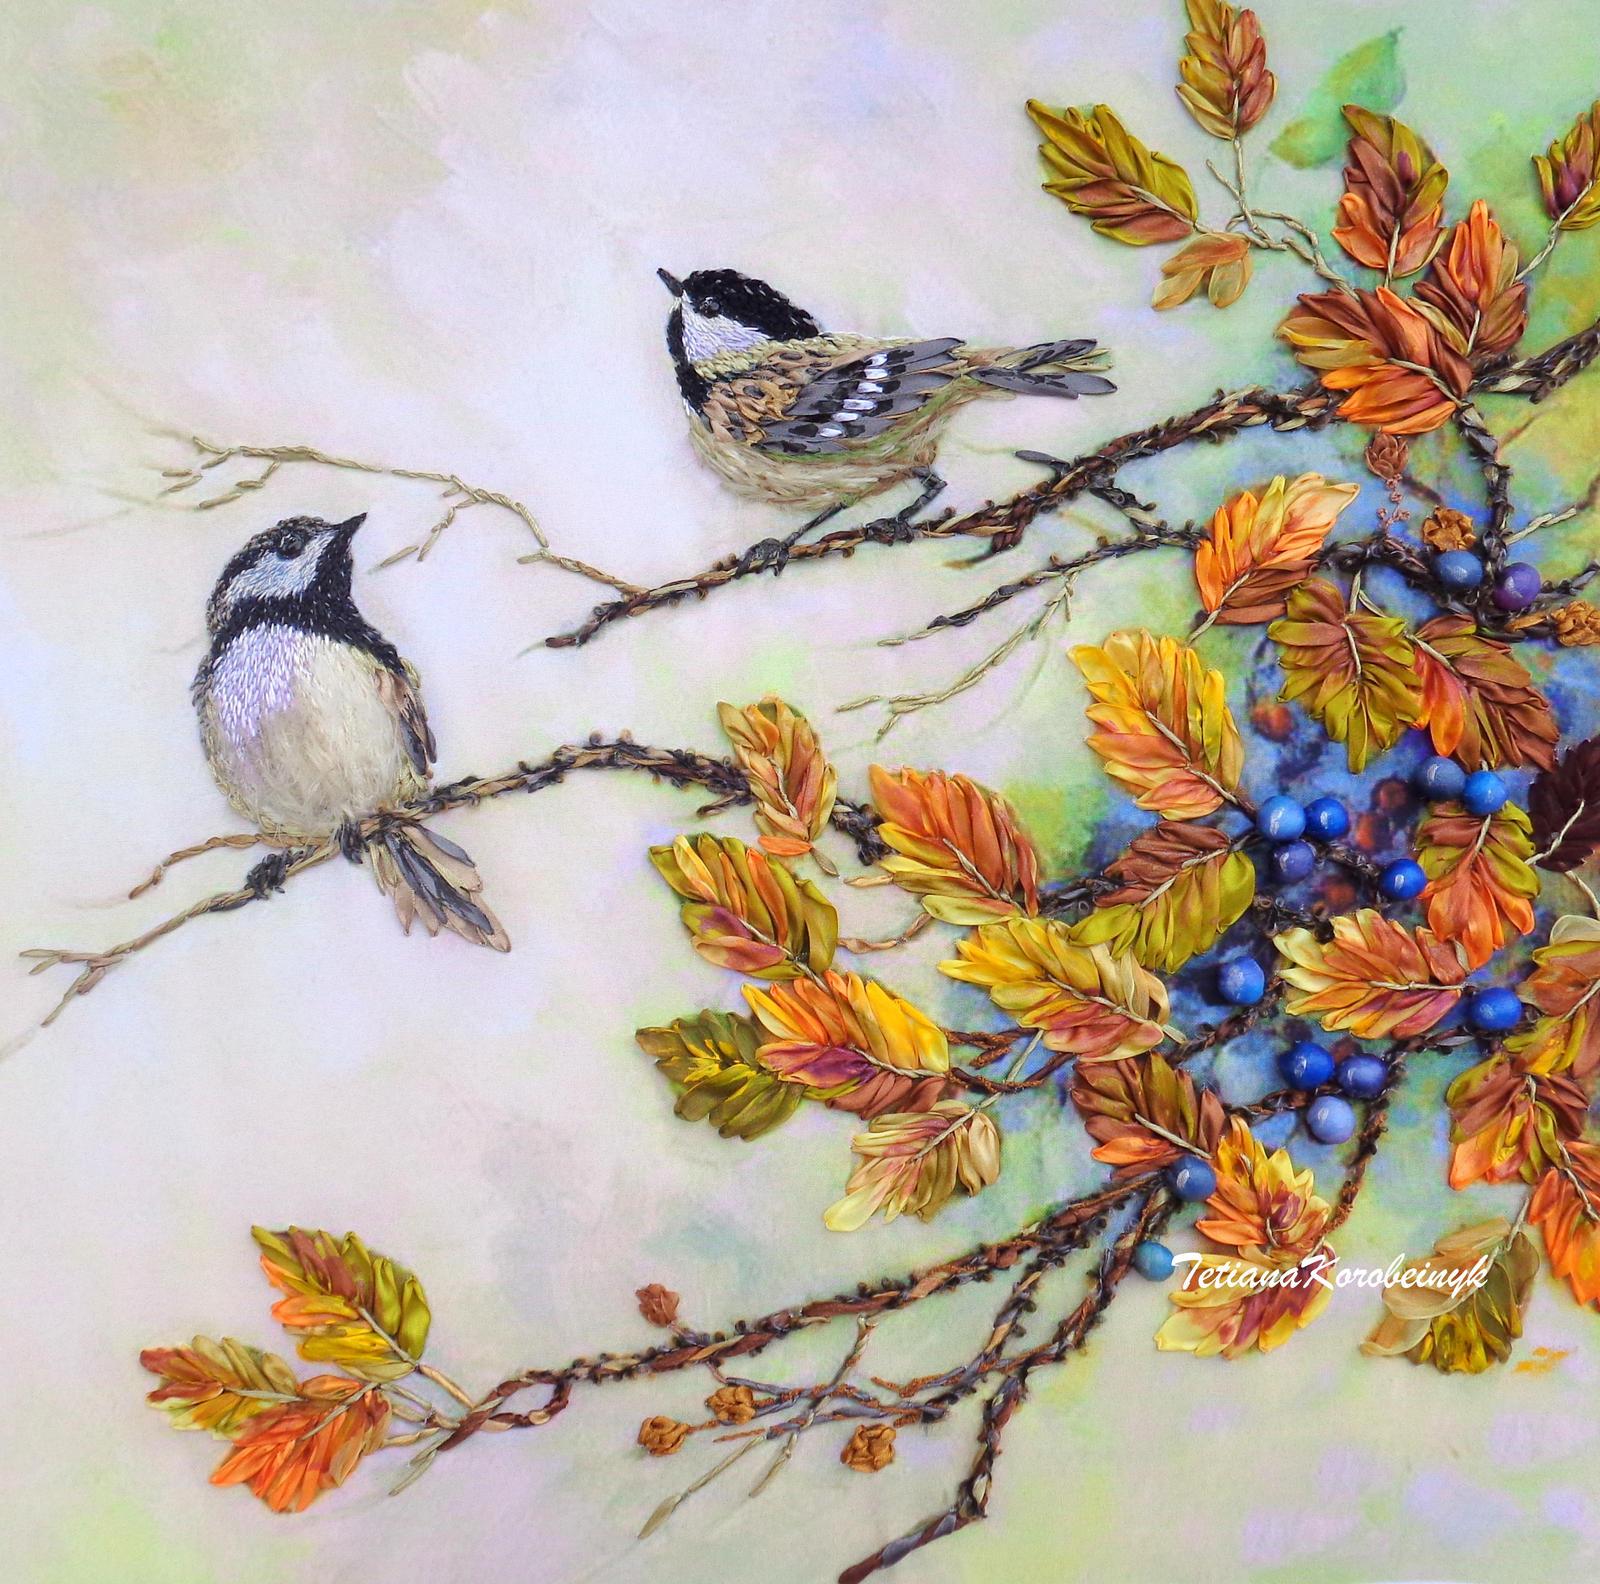 �yf�z#by�NyK^[�_autumn1 ribbon embroidery by tetianakorobeinyk